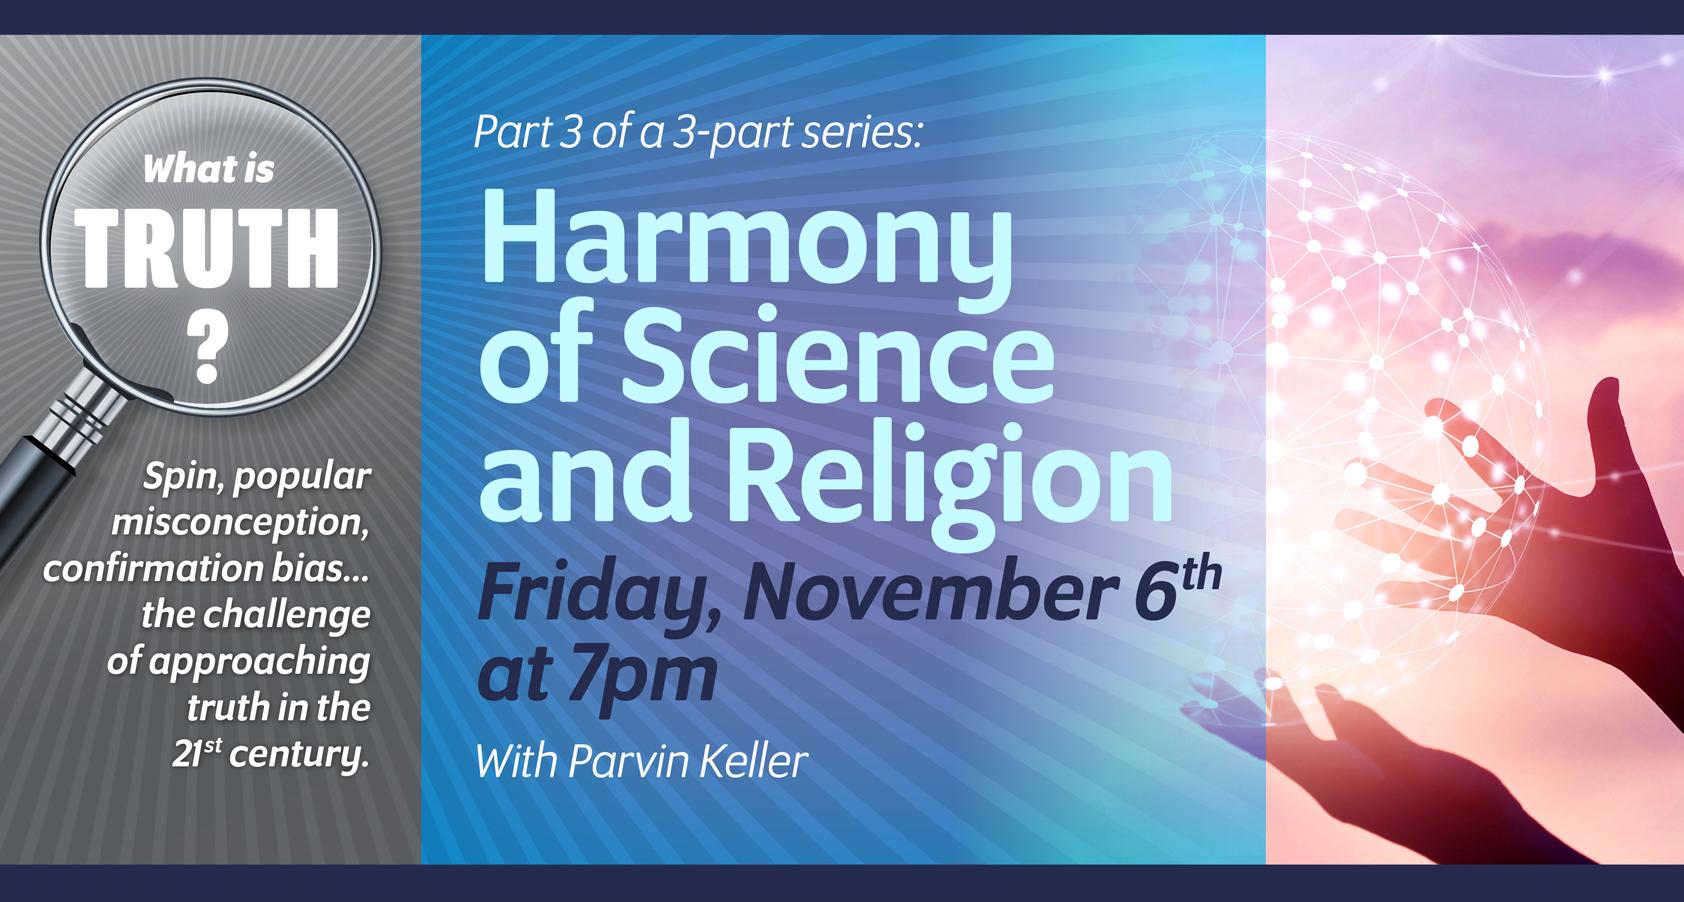 Harmony of Science and Religion, November 6 at 7pm